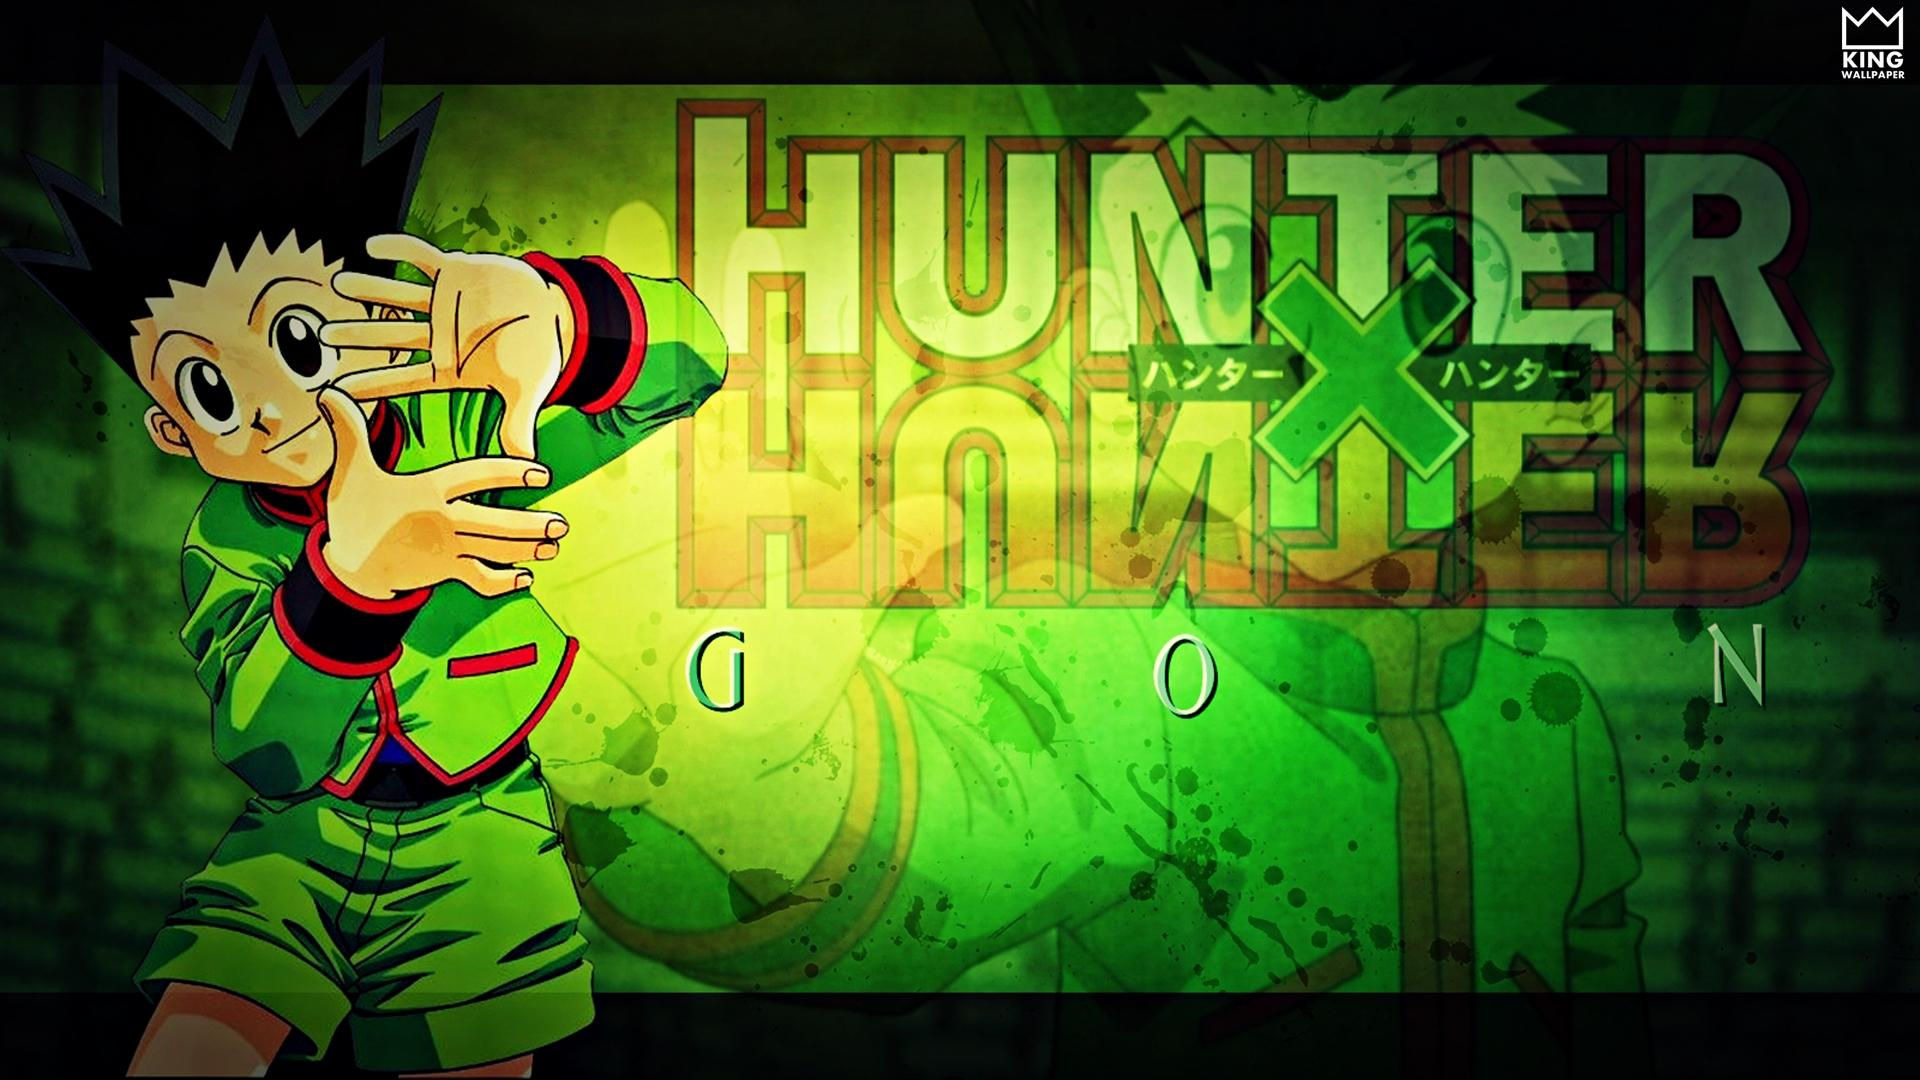 gon wallpaper hunterxhunter by kingwallpaper on deviantart